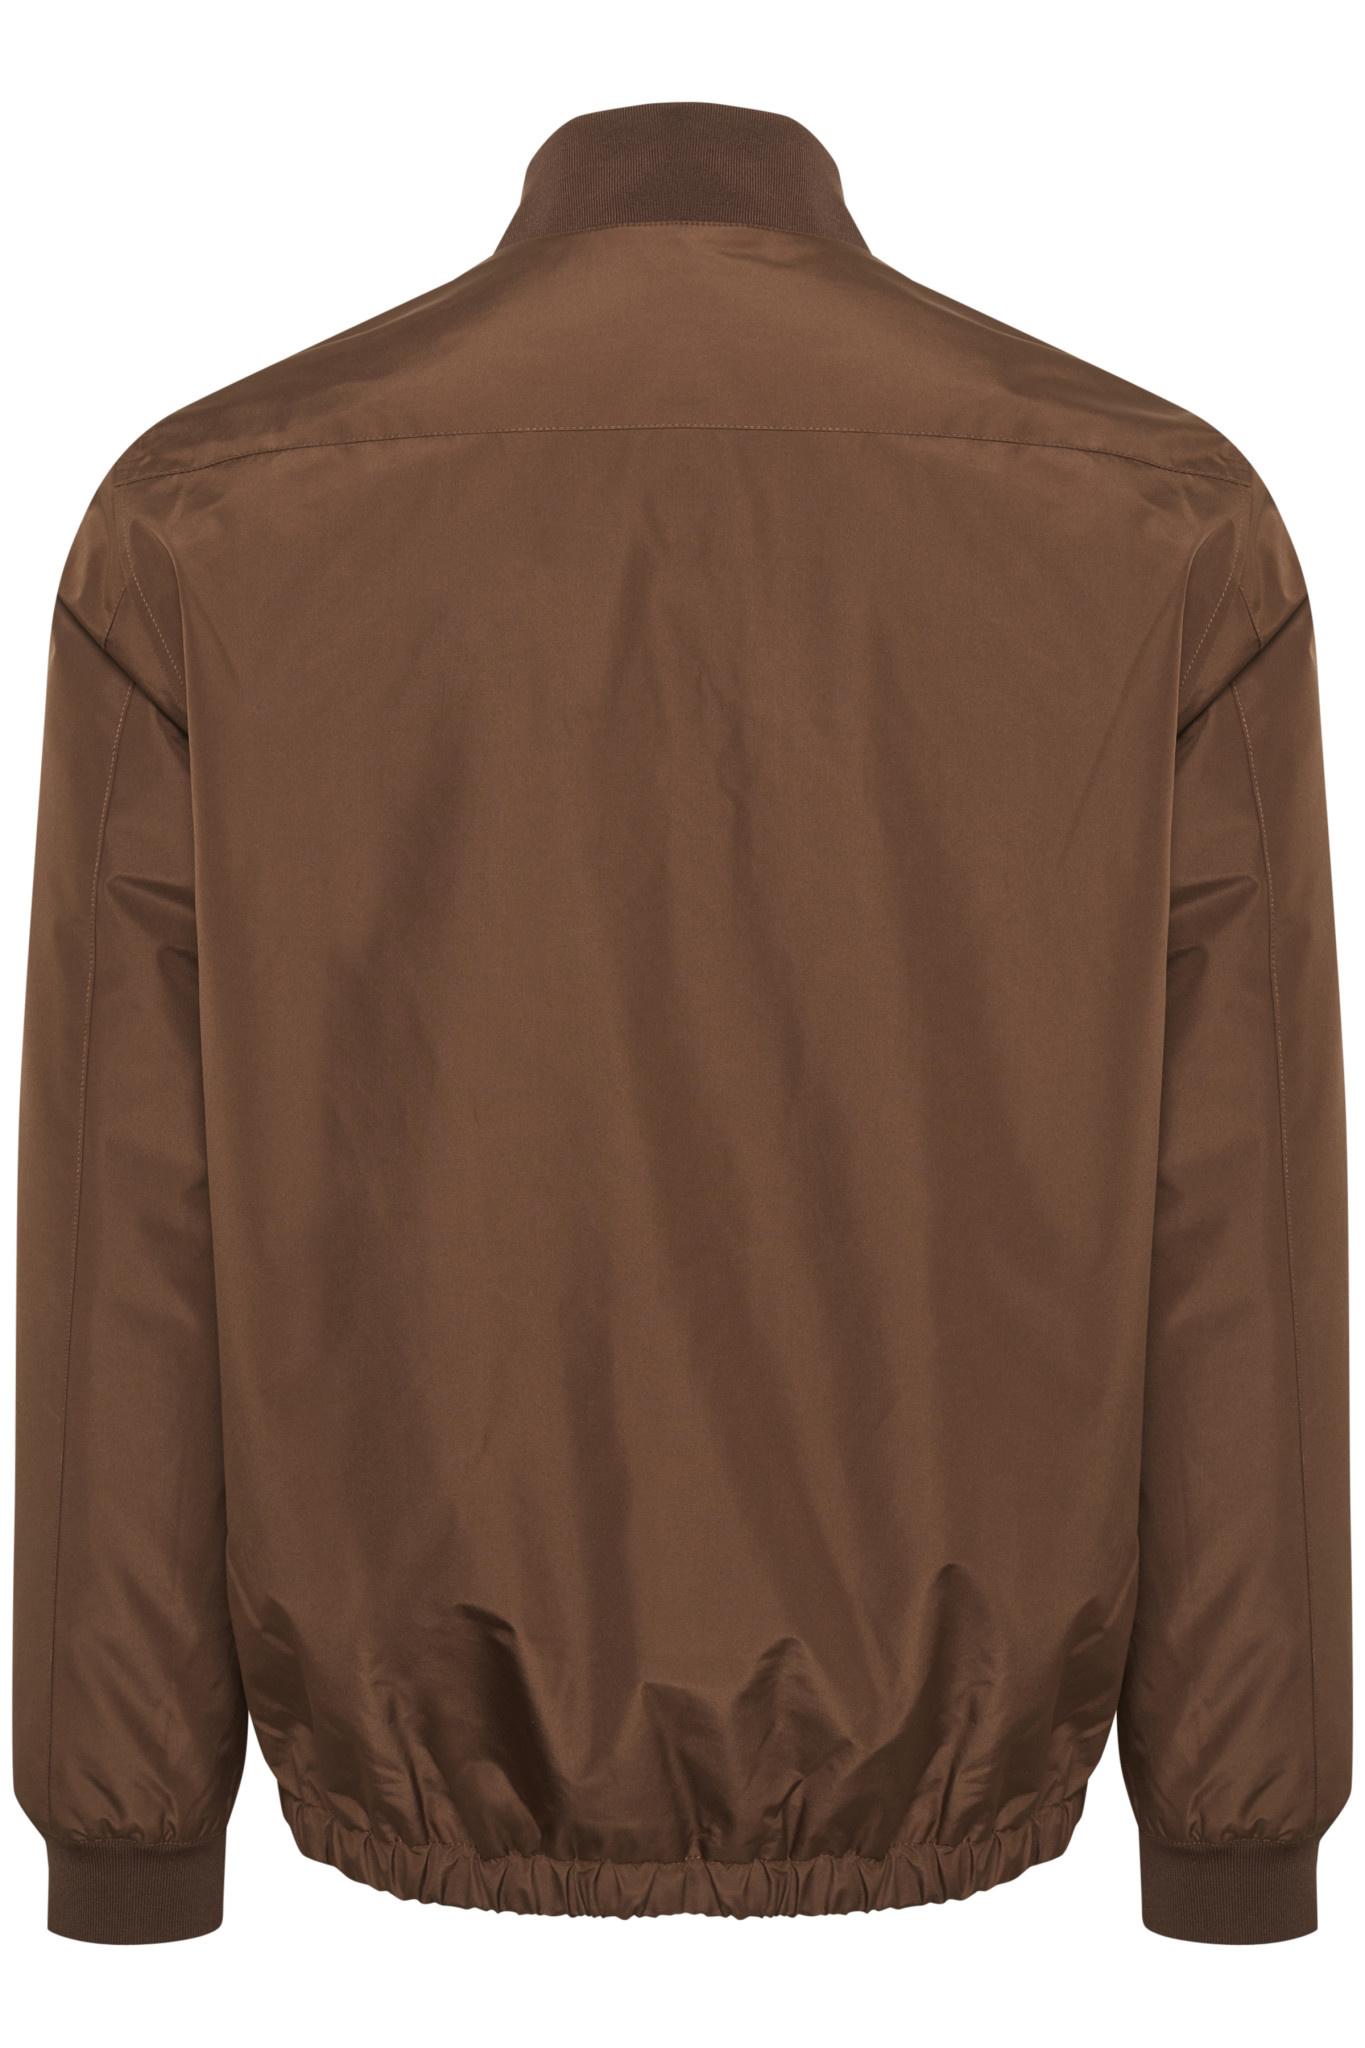 Dressy Bomber Jacket